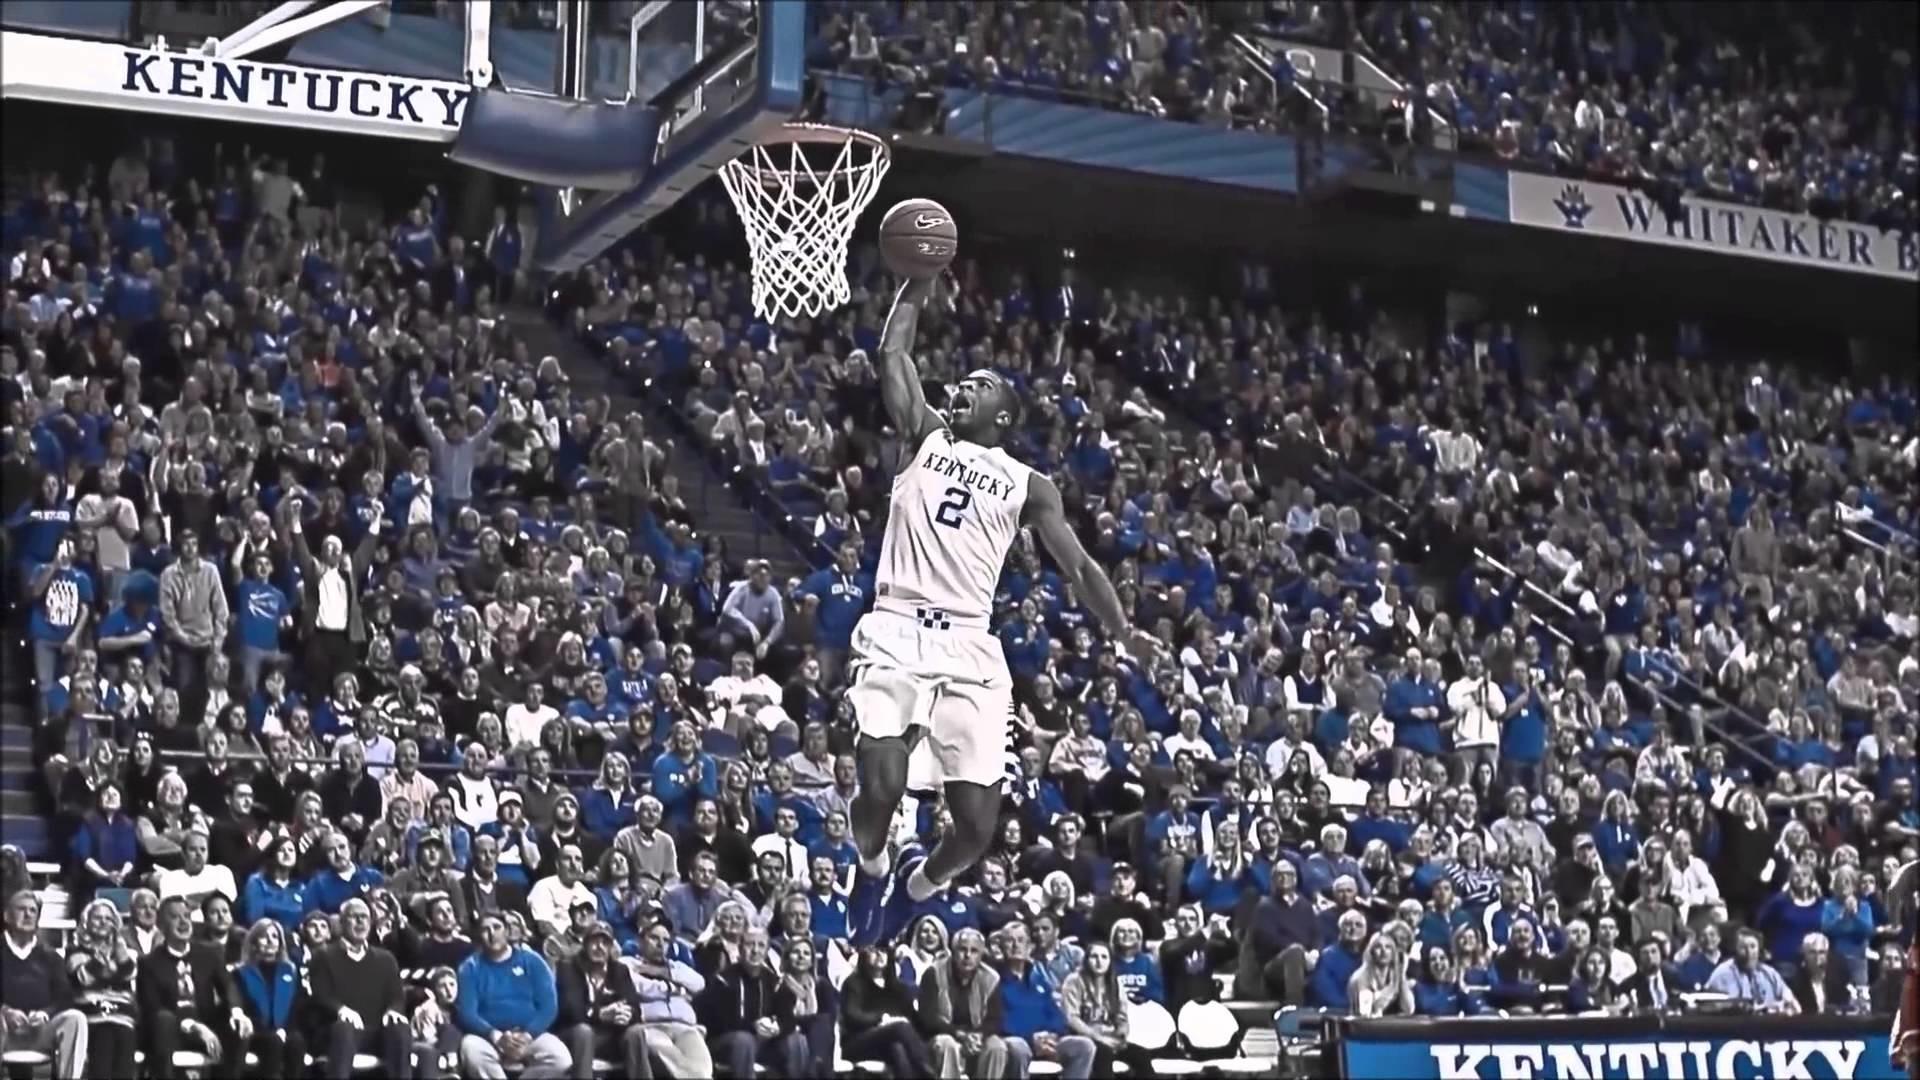 Kentucky Wildcats Wallpapers: Kentucky Wallpapers ·①